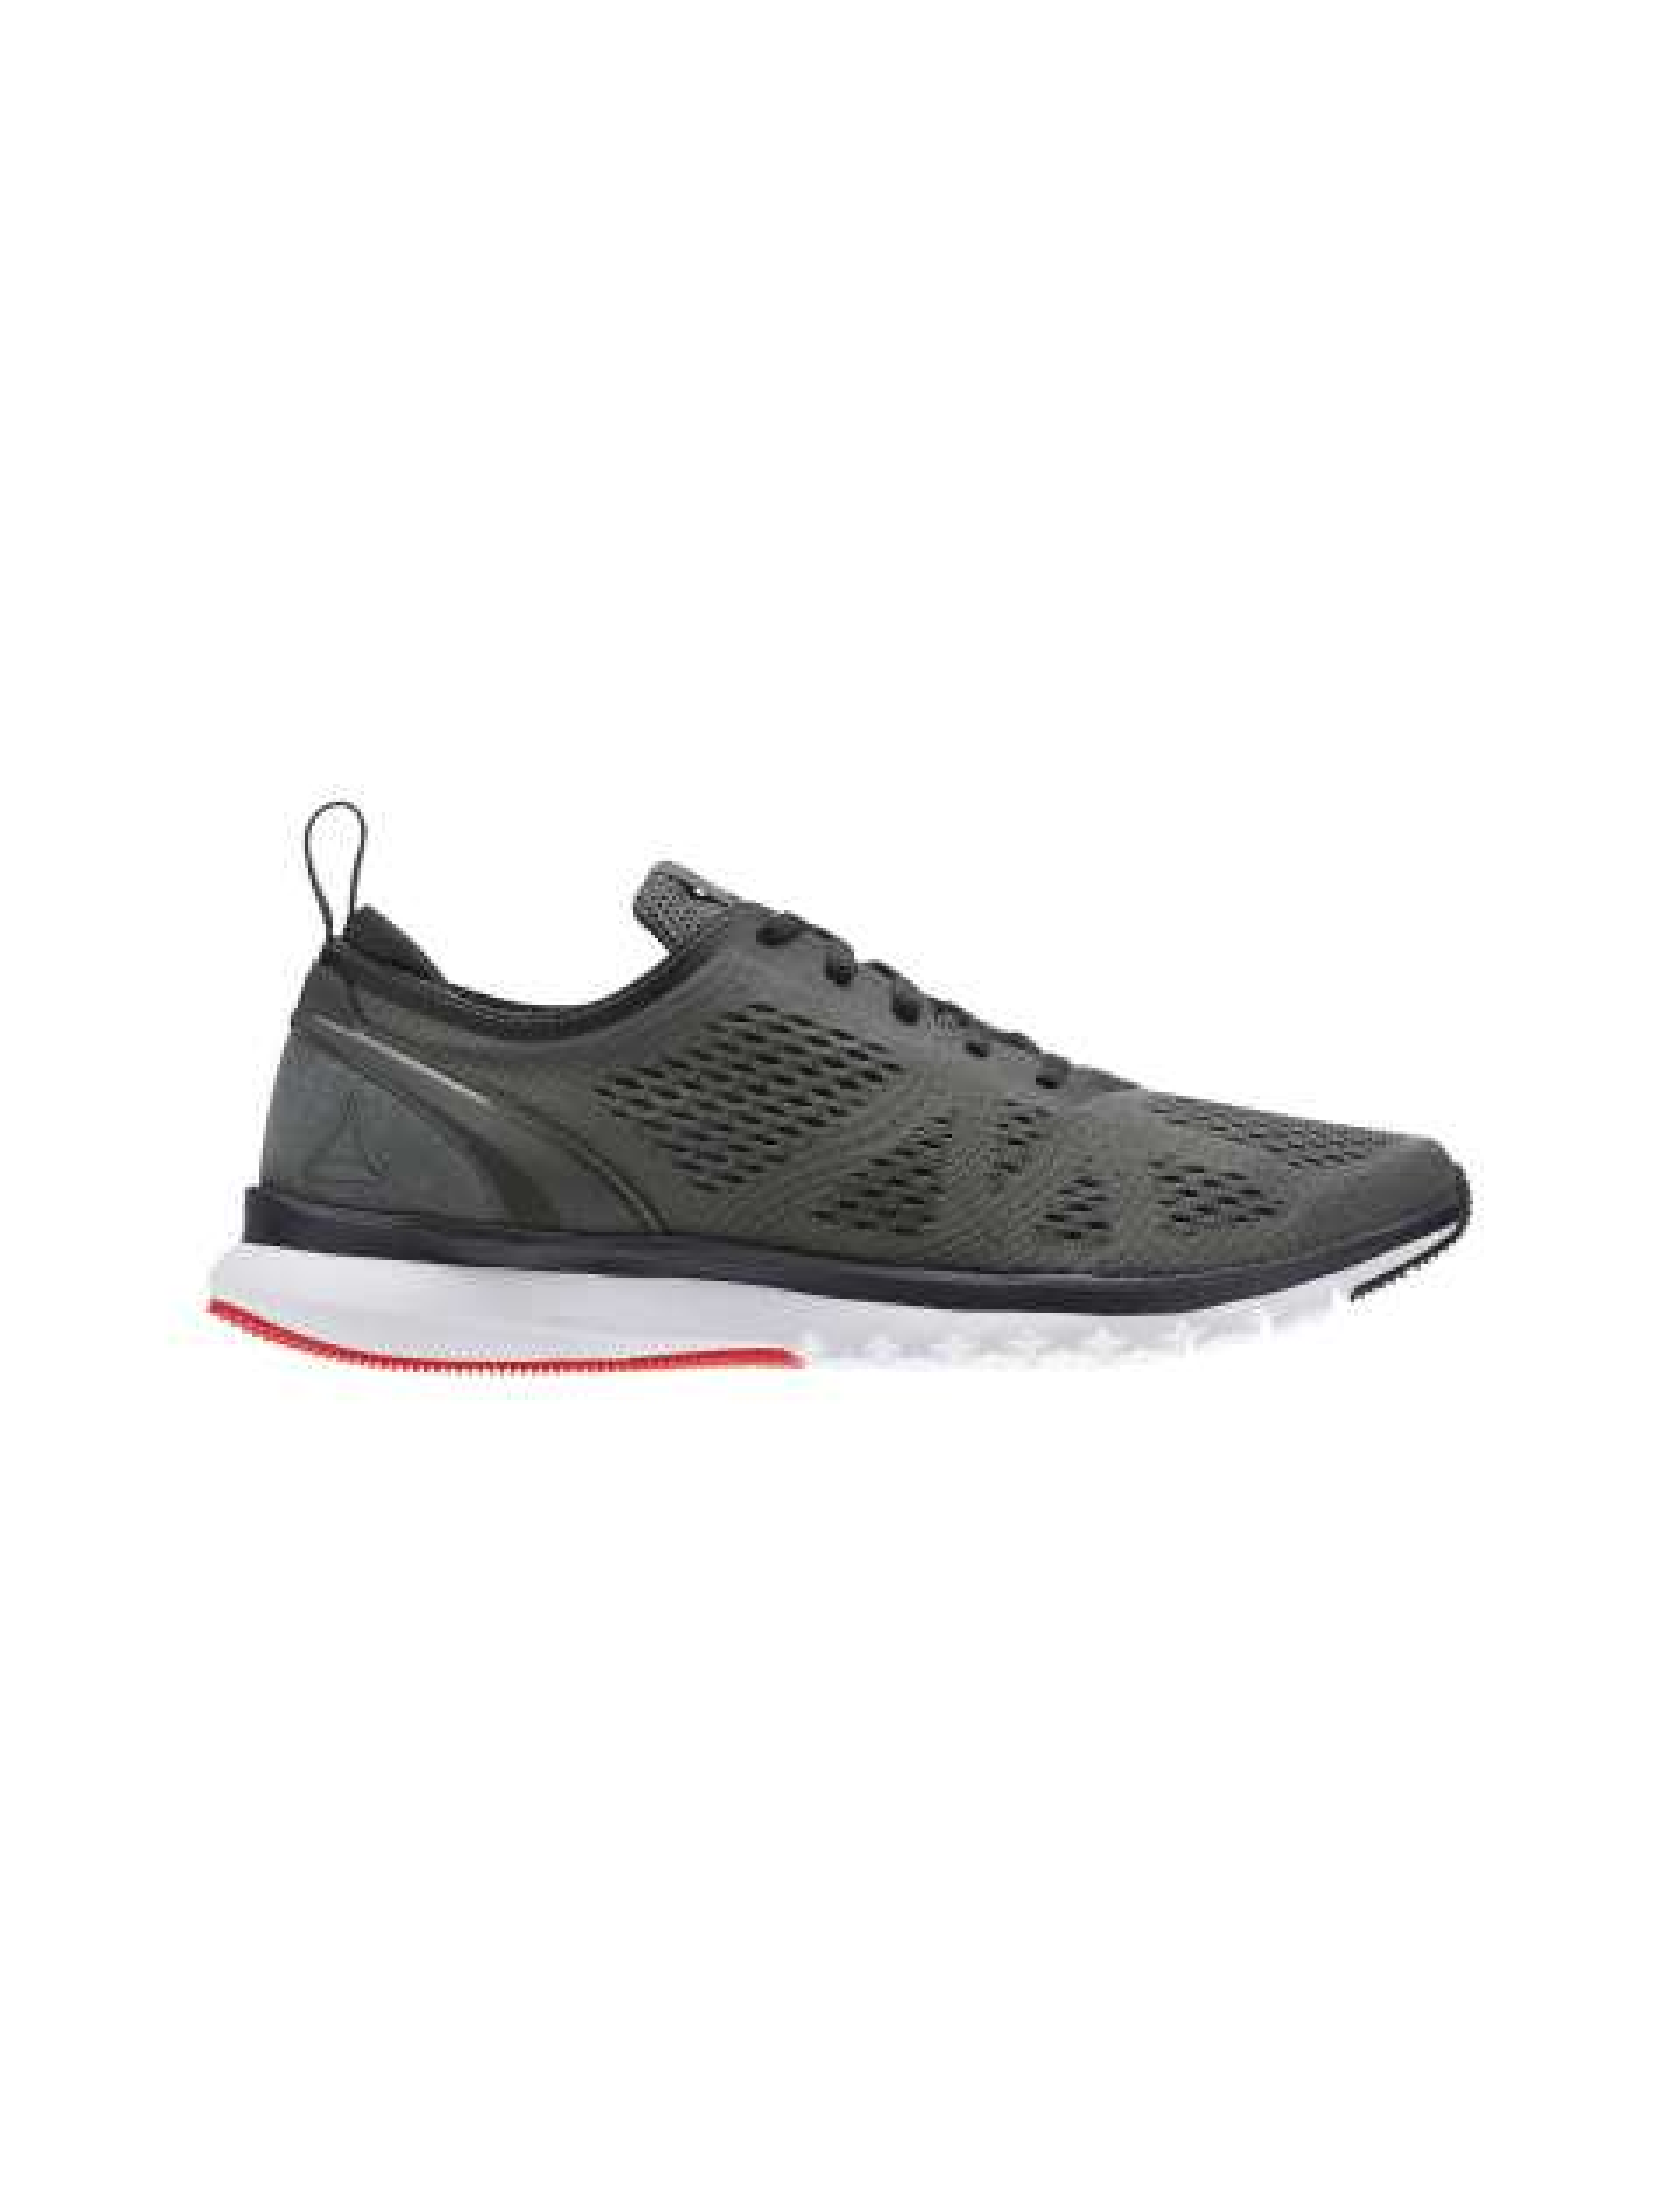 کفش دویدن بندی مردانه Smooth Clip Ultraknit - ریباک